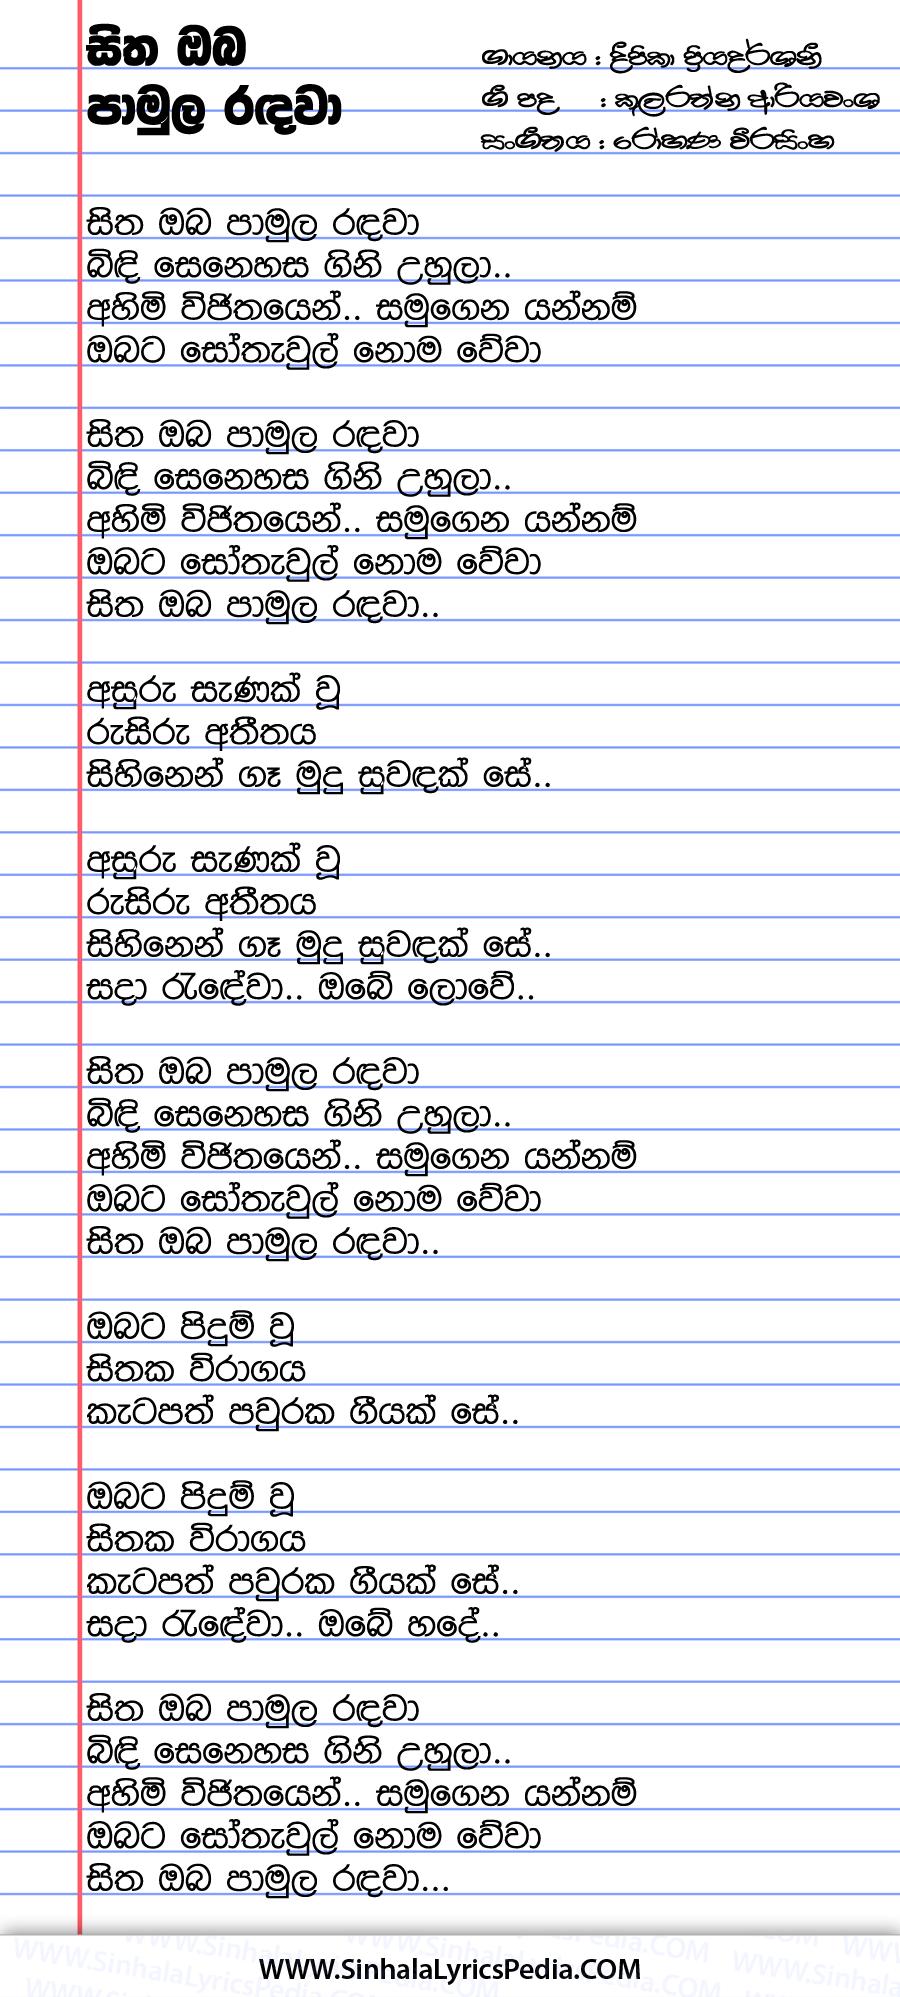 Sitha Oba Pamula Radawa Song Lyrics